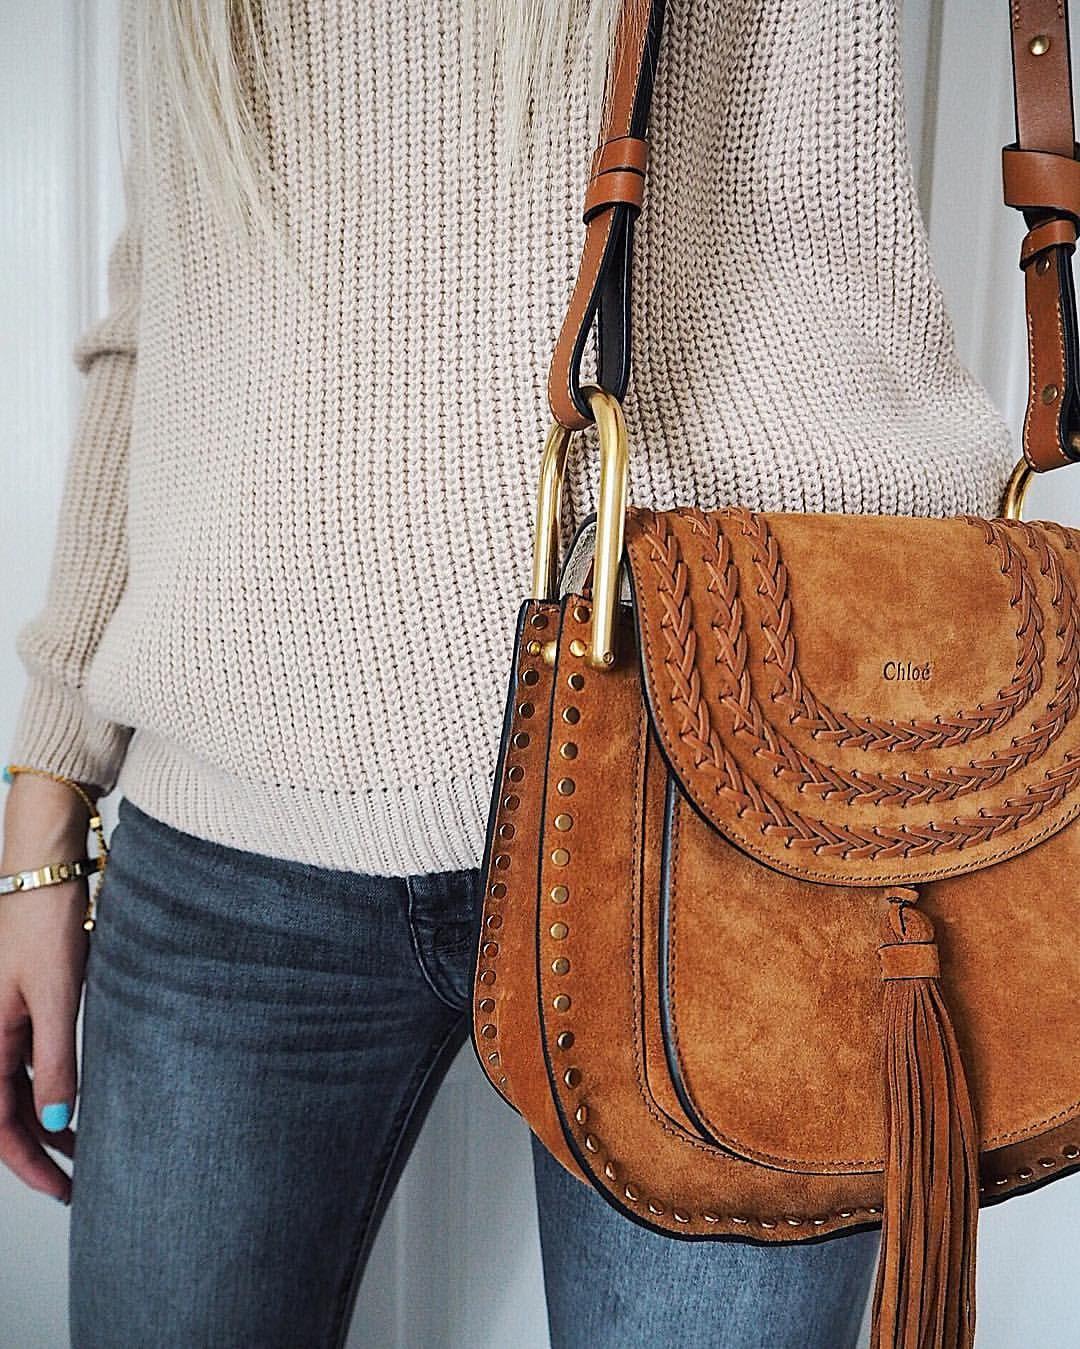 c47b3e86e Instagram @emilyjanehardy Chloe Hudson bag, tan handbag, Chloe fashion, miss  selfridge knitted jumper, grey mango denim, fashion